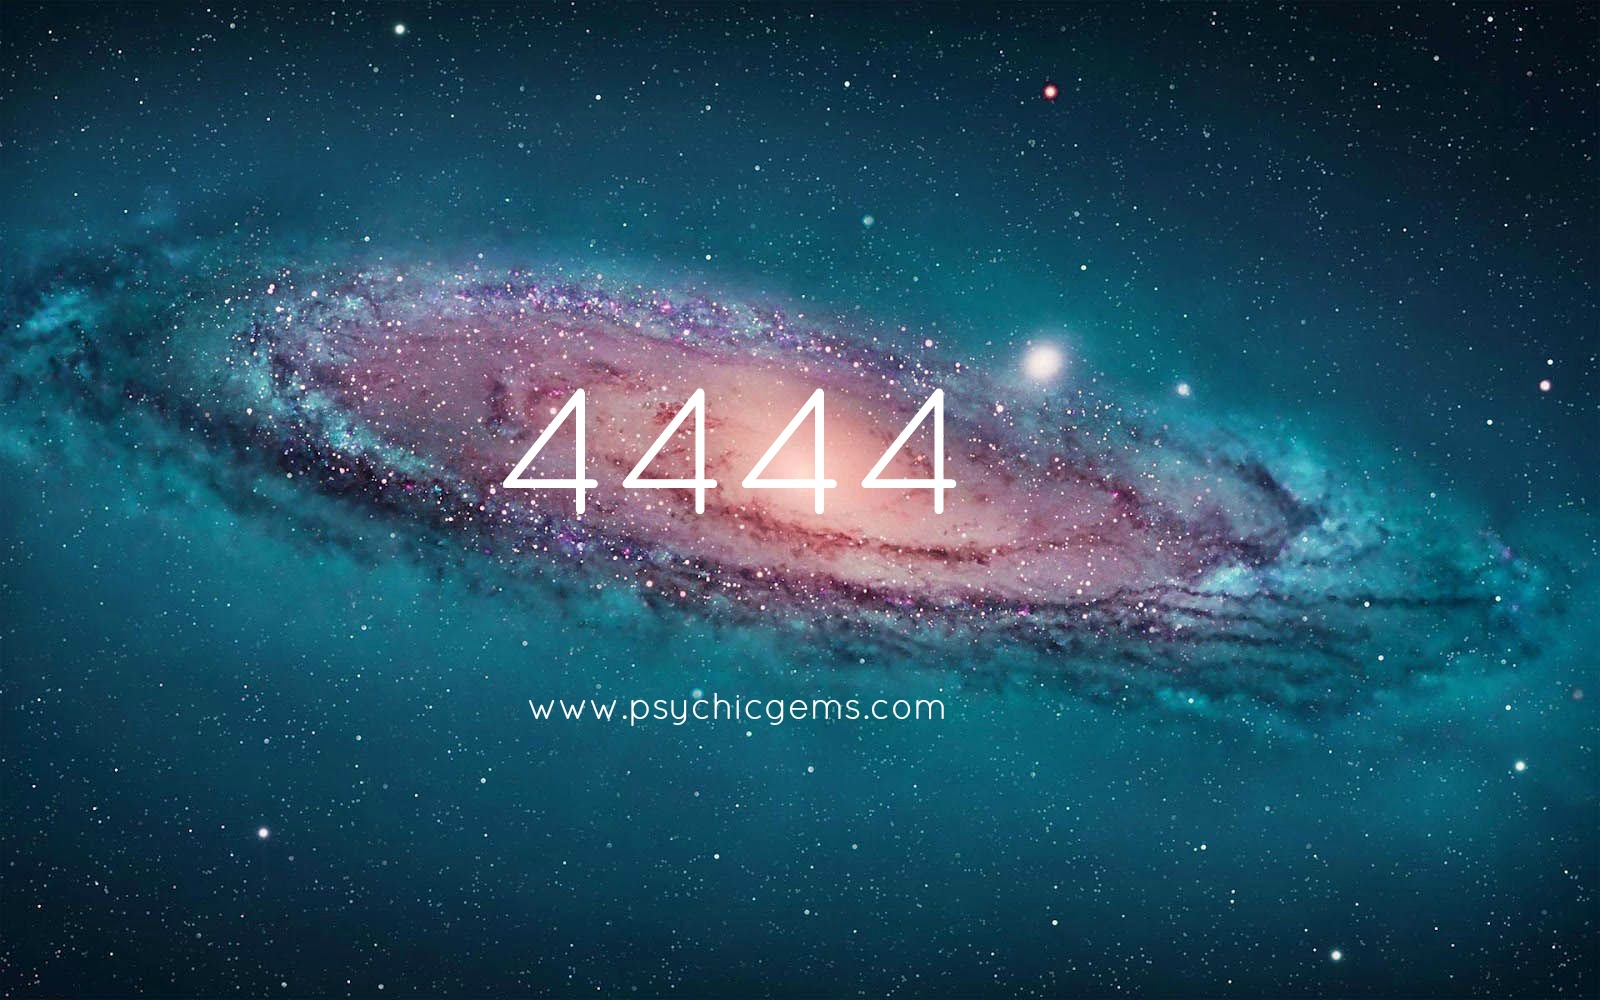 Galaxy Desktop Backgrounds 2 2